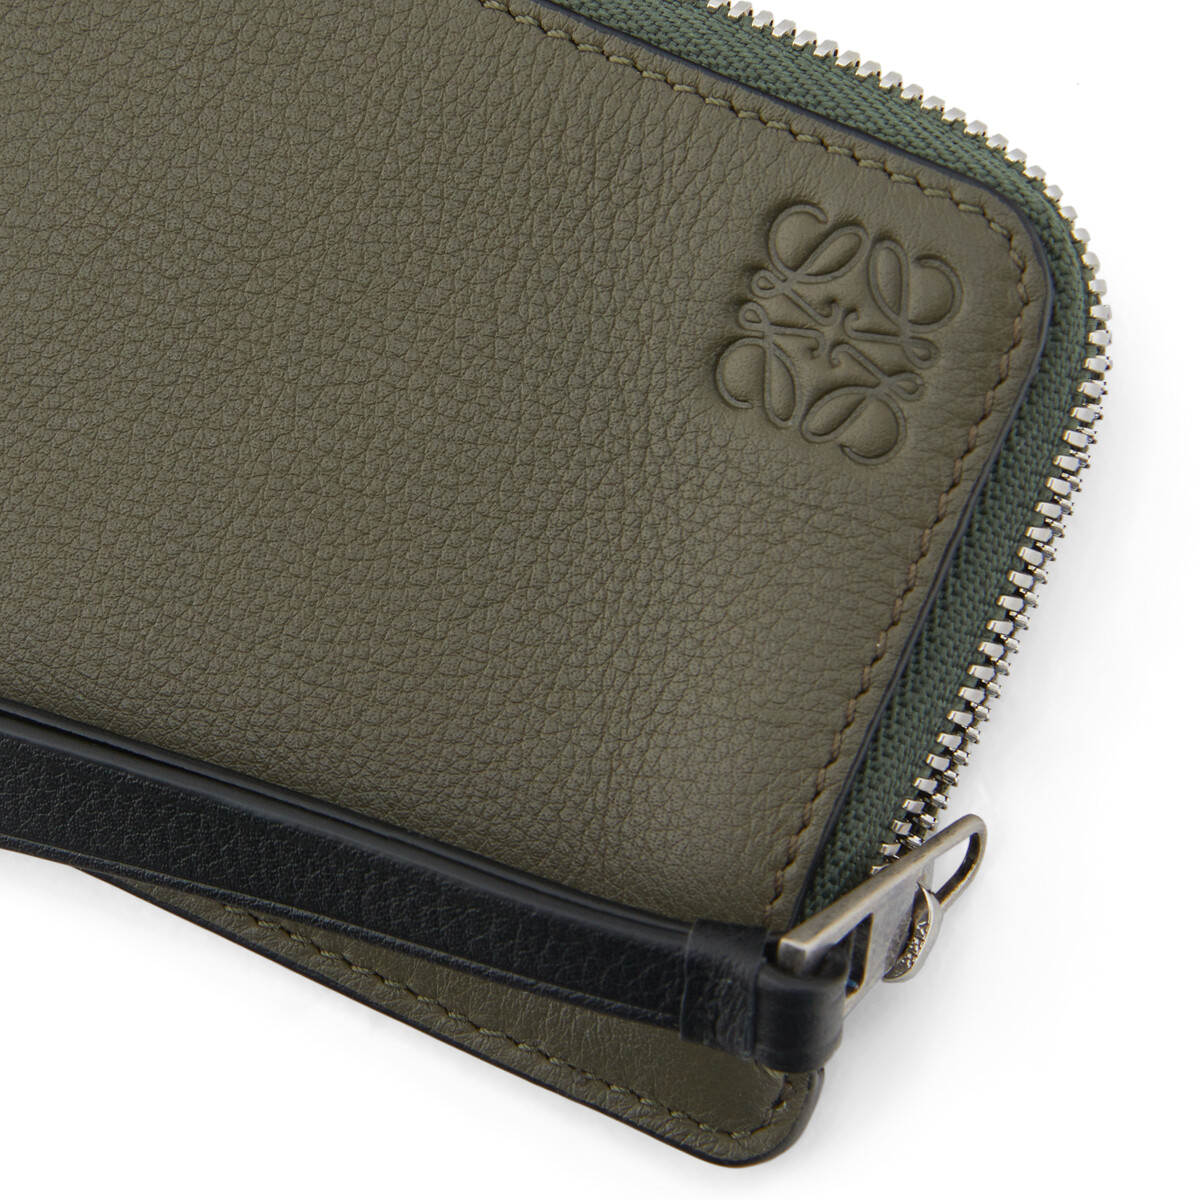 LOEWE Coin Cardholder Bicolor Khaki Green/Cognac front